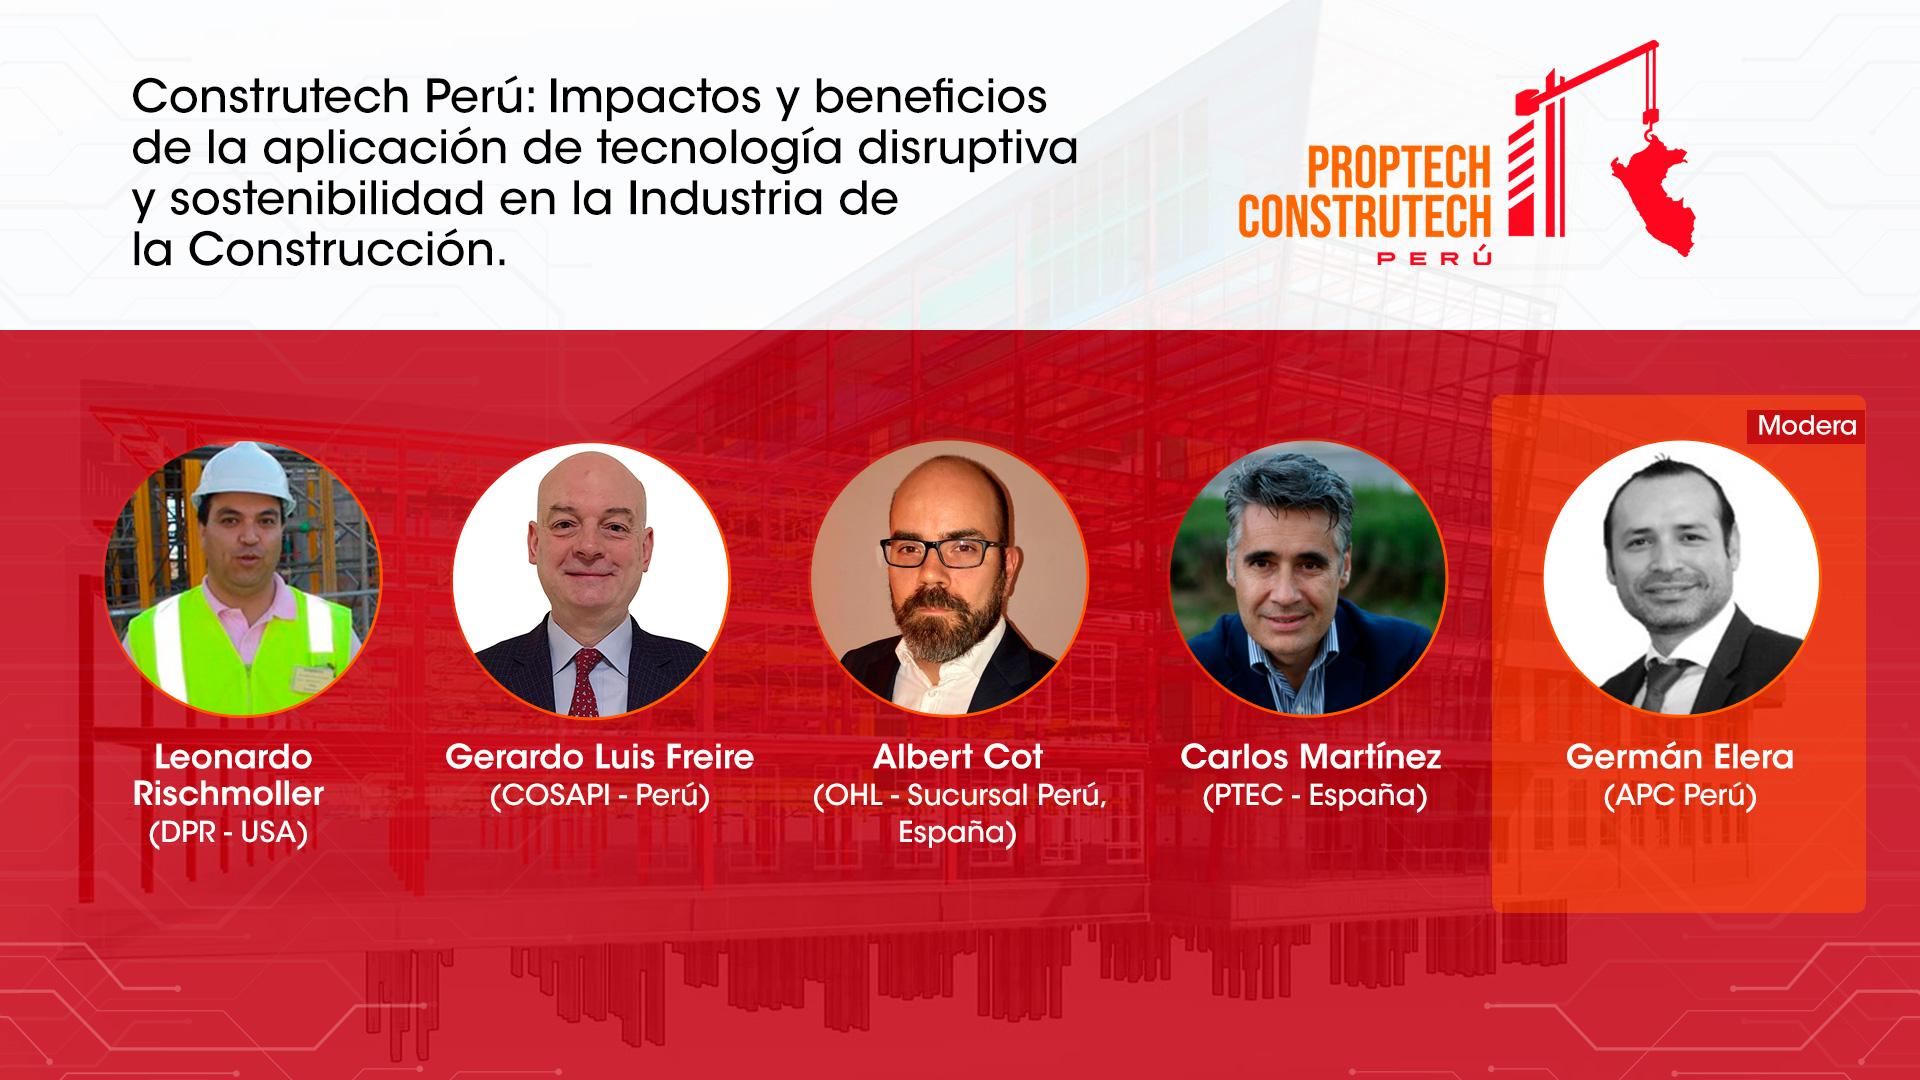 Construtech-Perú1920x1080